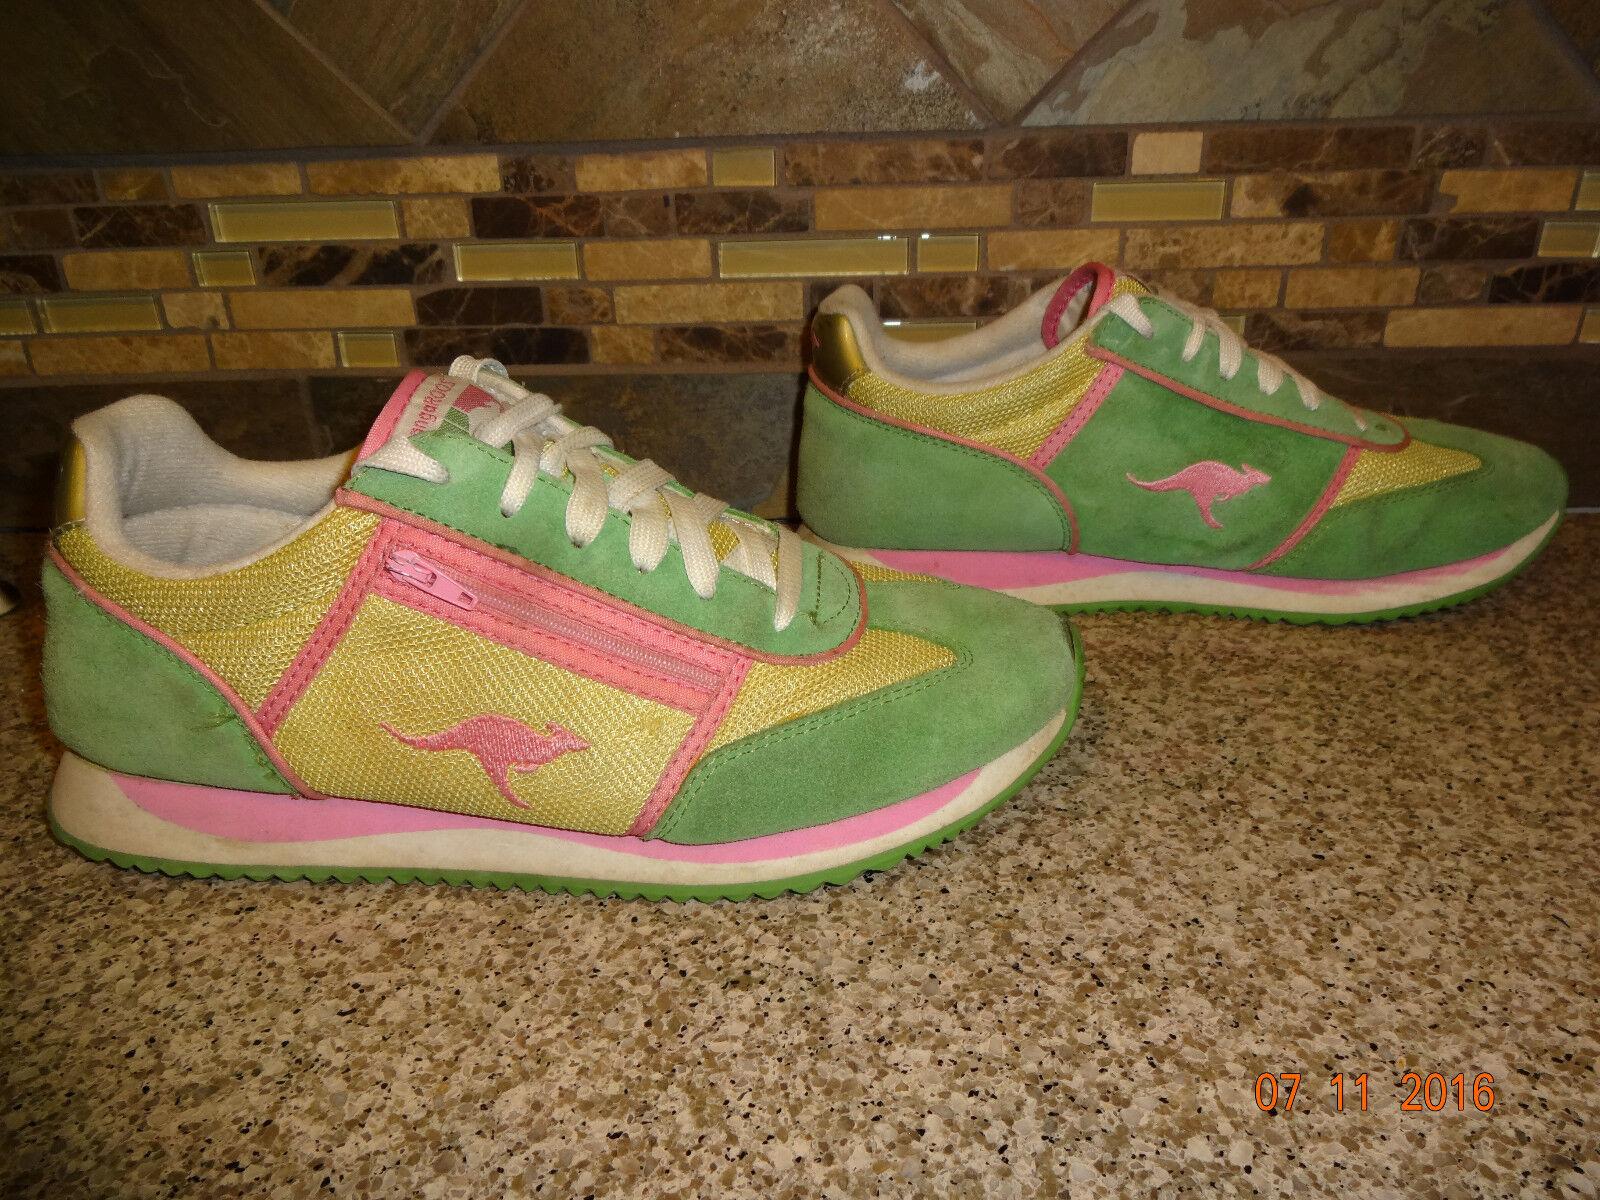 Vintage Sz Donna KangaKOOS Sz Vintage 9 EUR 40 Green/Yellow/Pink Athletic Shoes Zipper d3da85